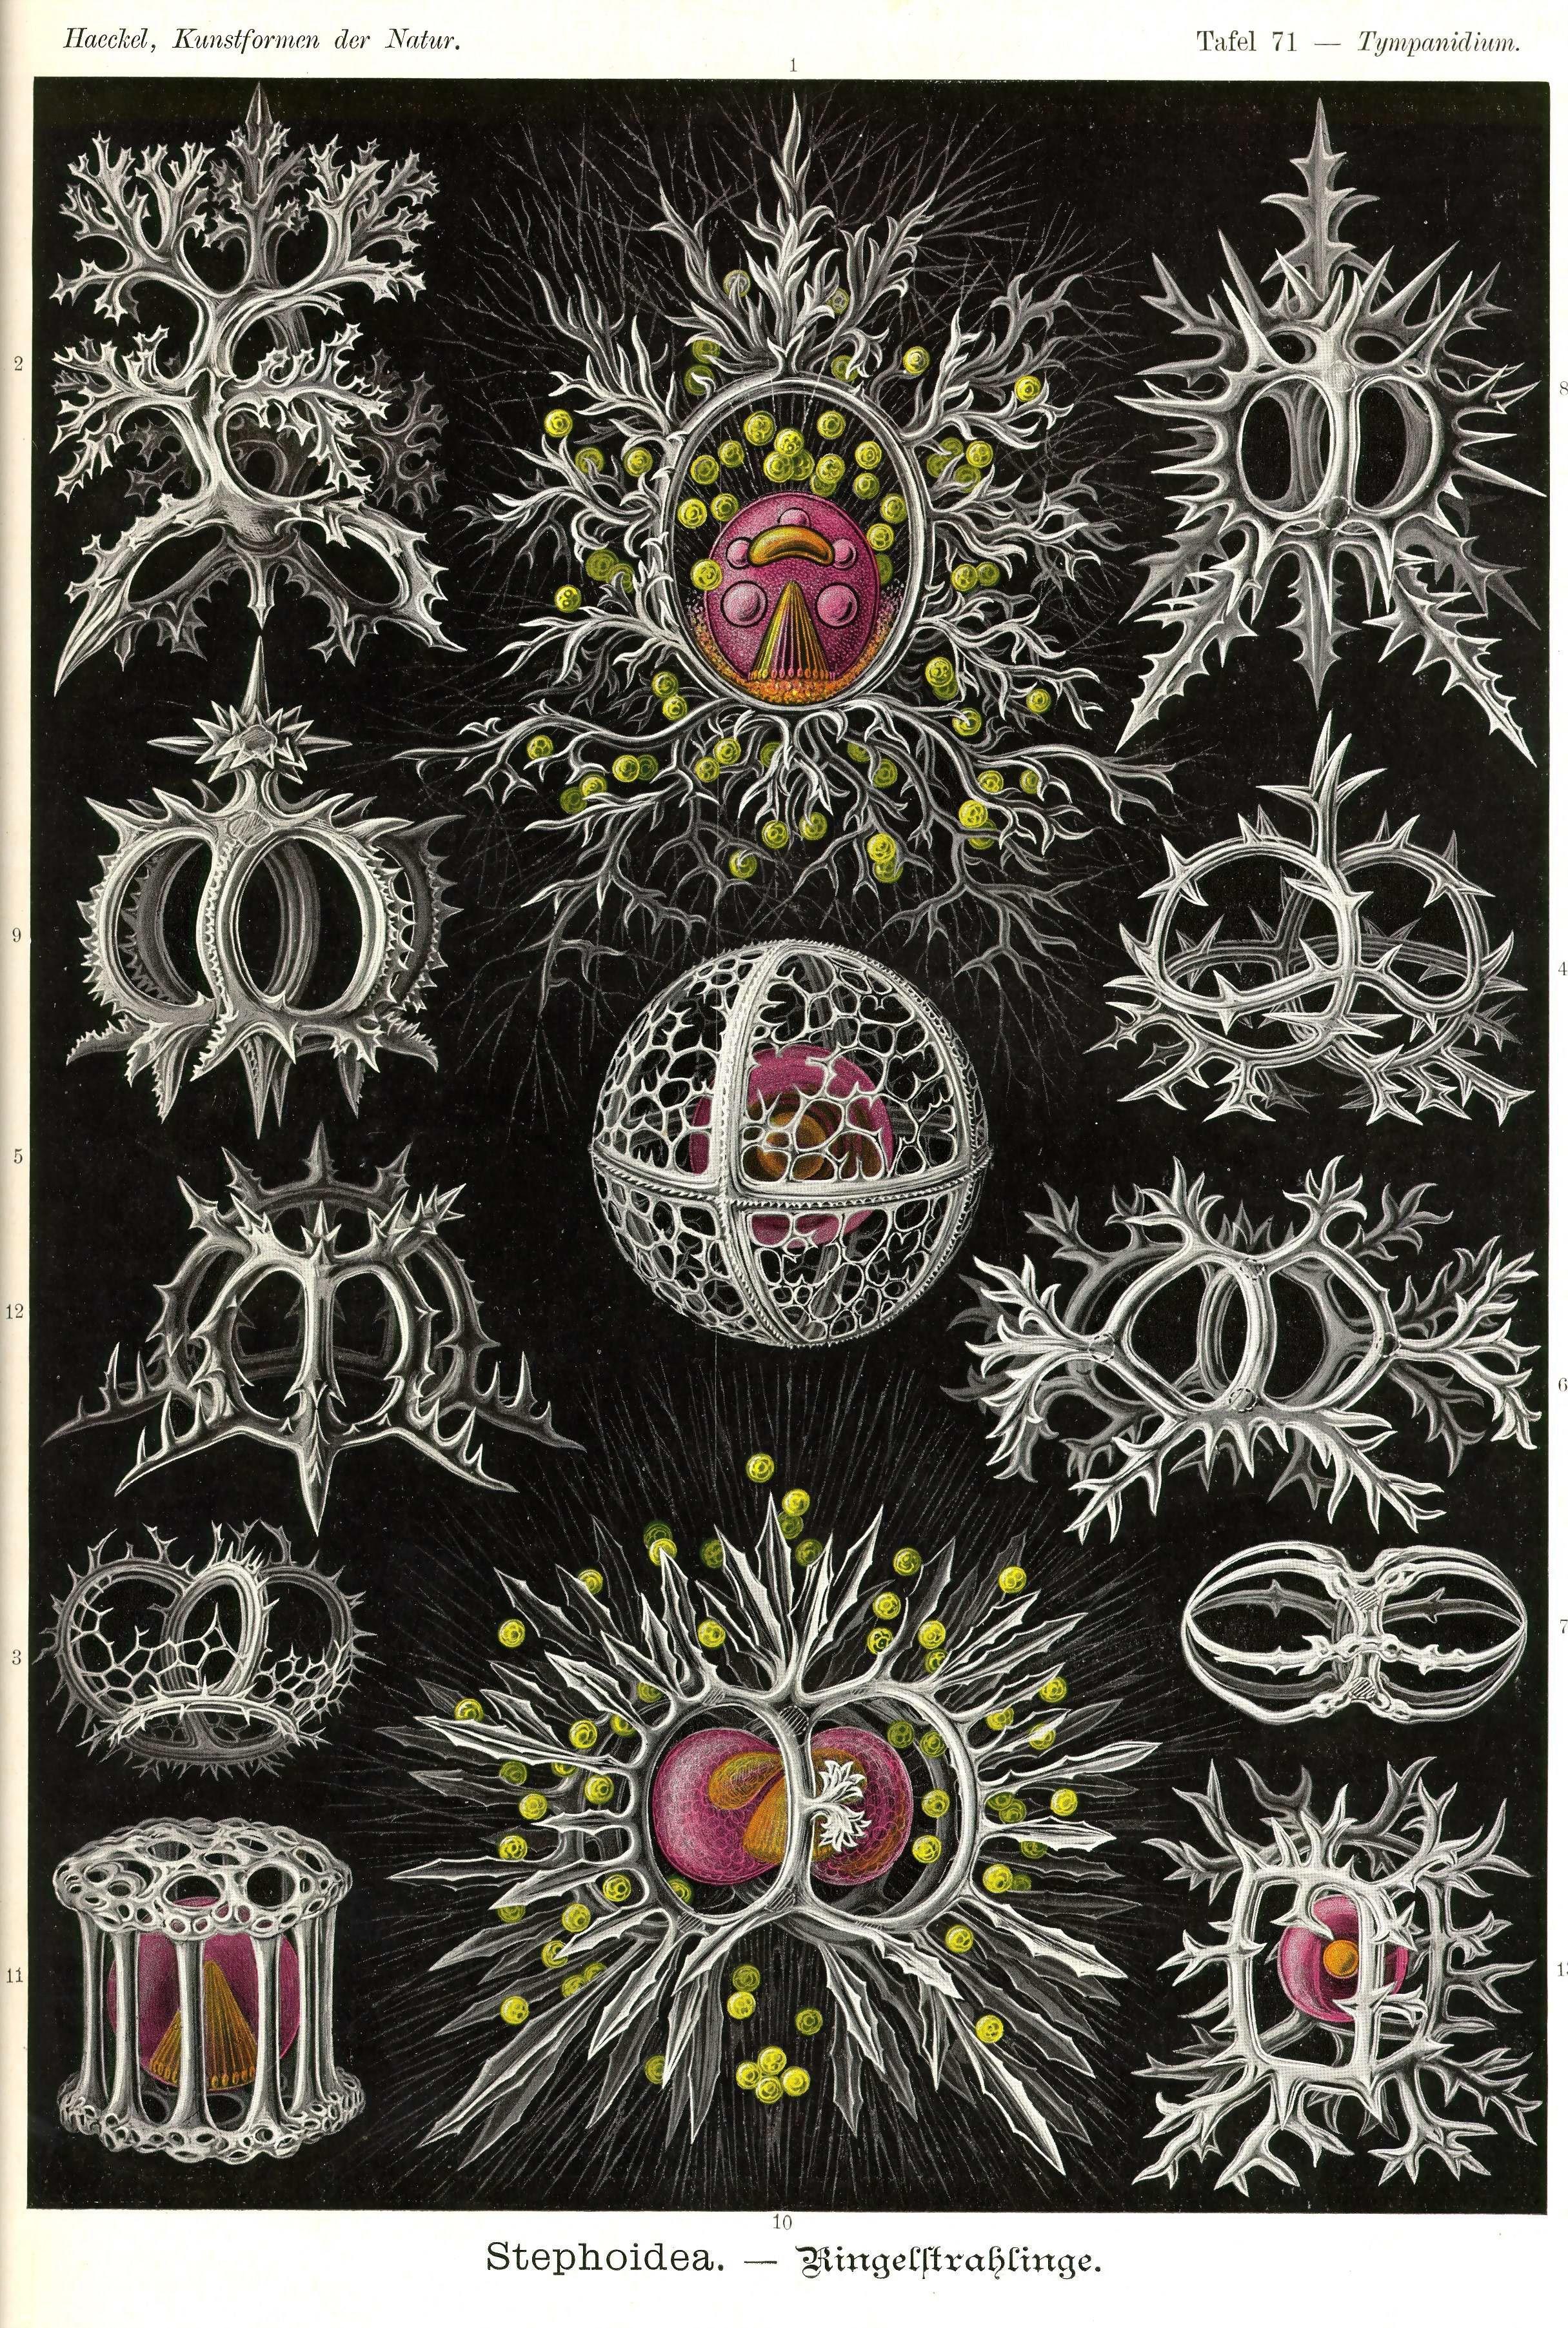 Kunstformen der Natur Tafel 71 - Tympanidium